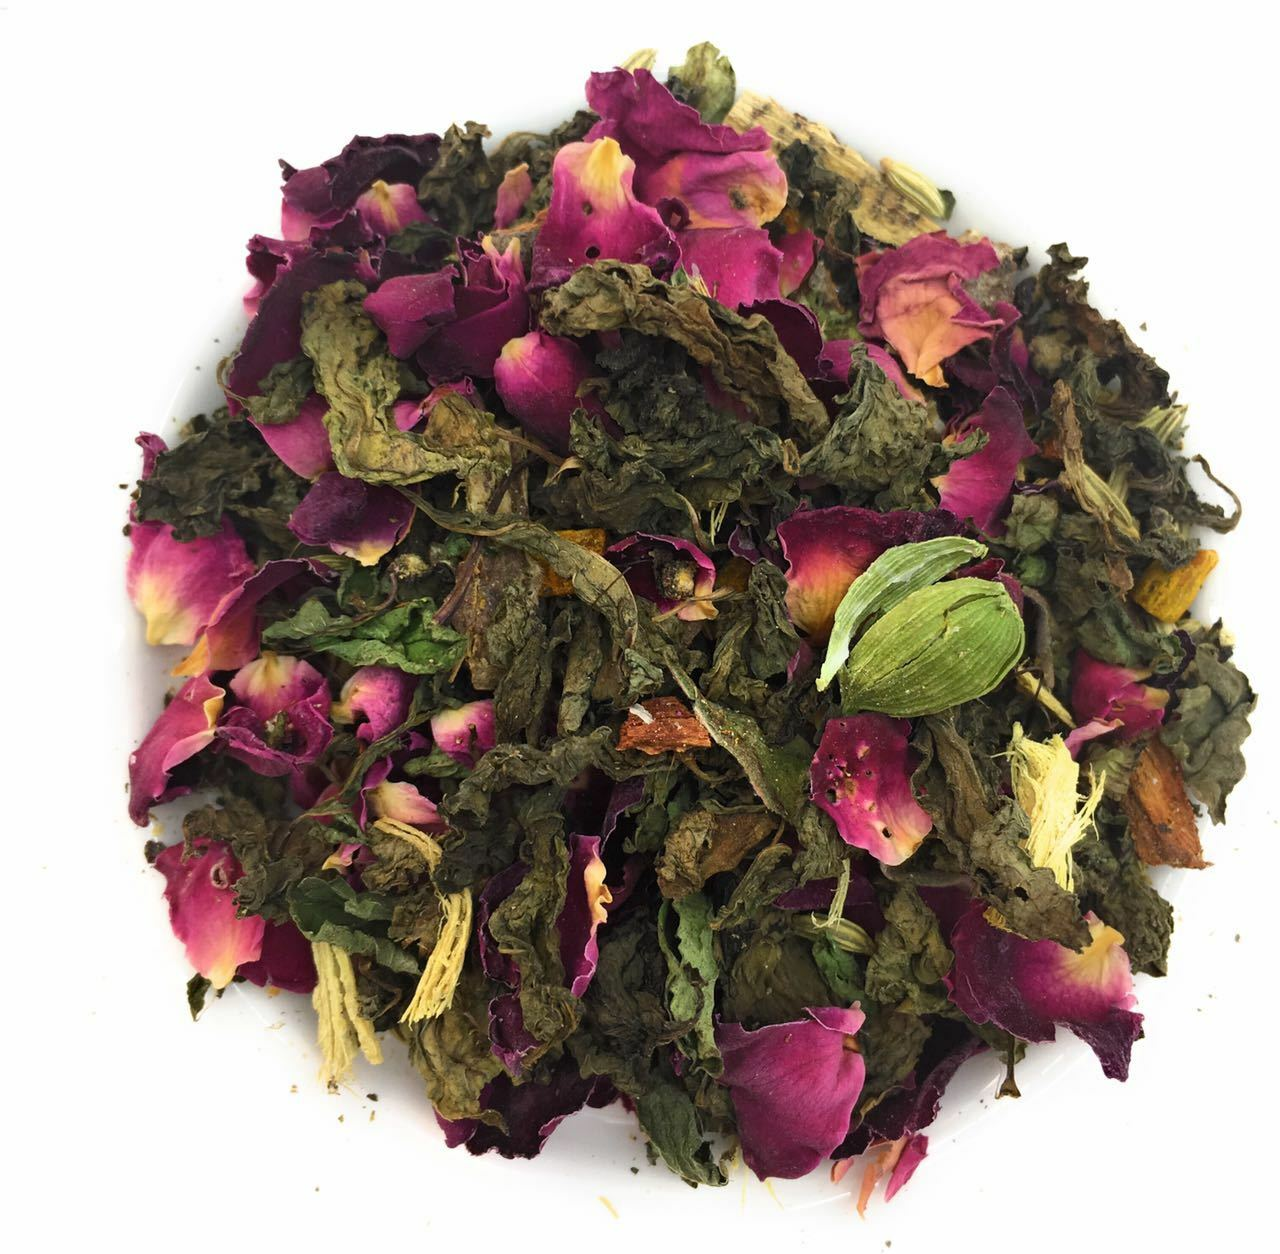 ayurvedic healthy weight loss tea herbal fresh